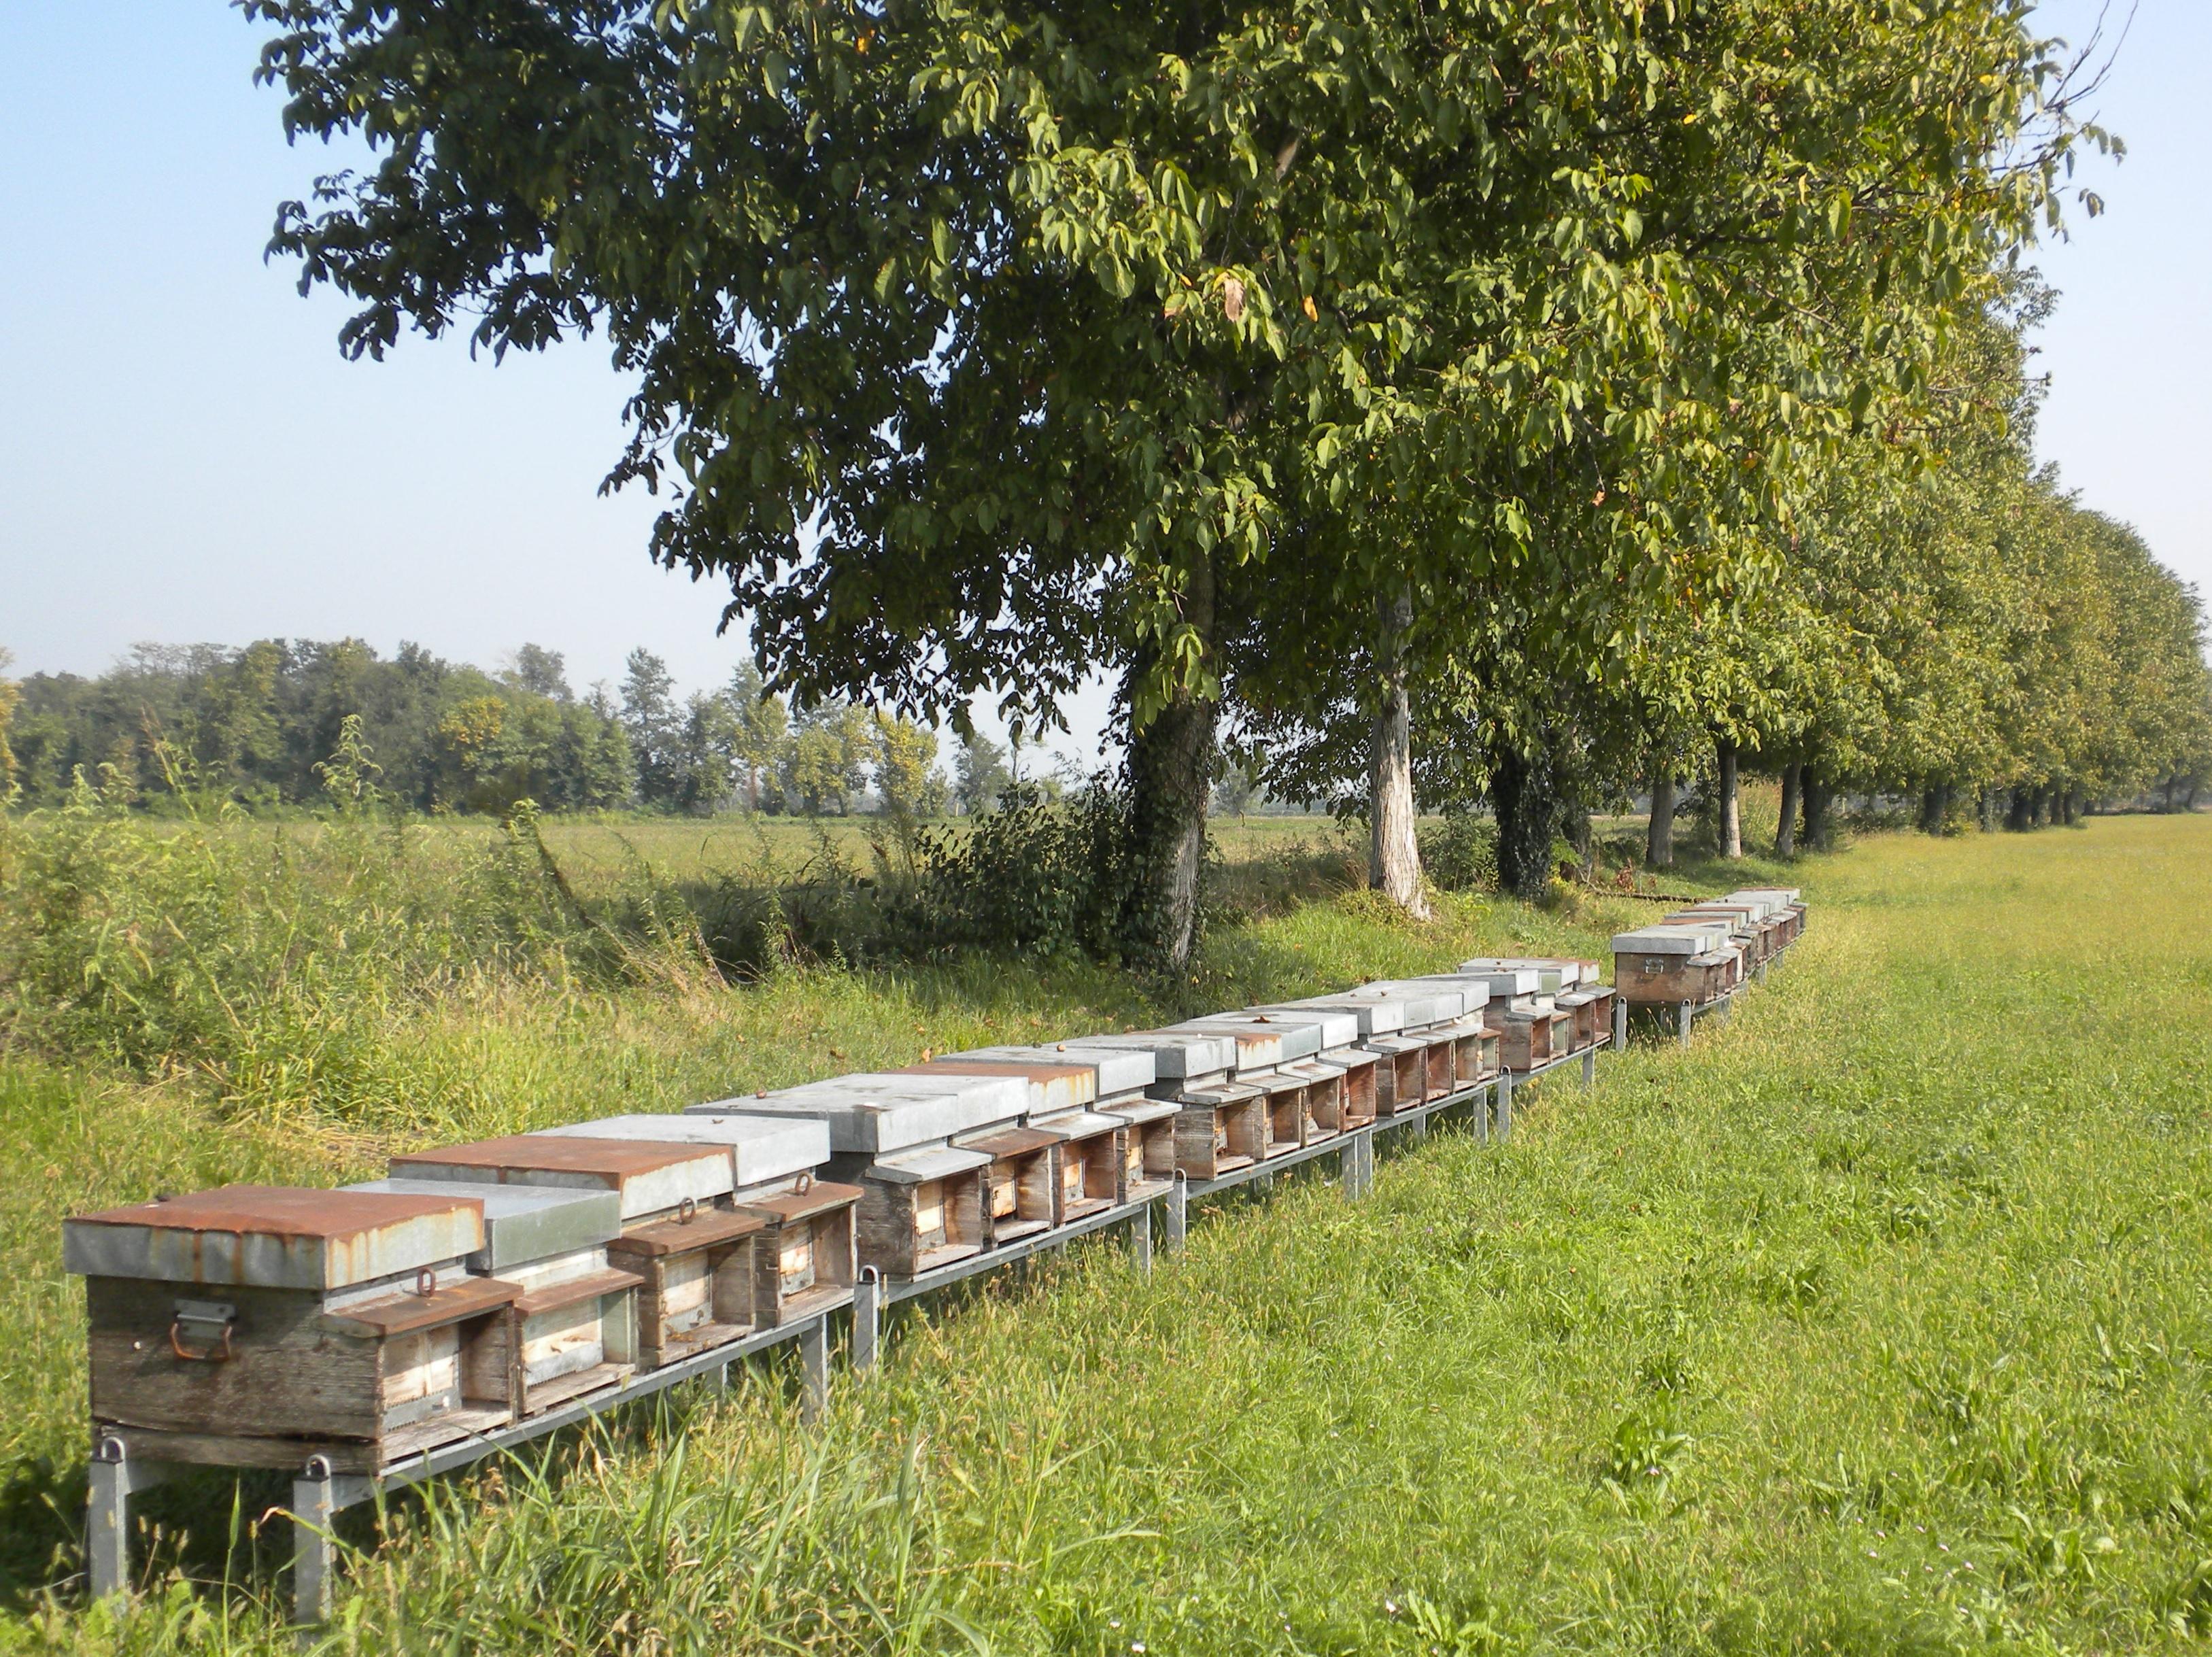 Alcune arnie per l'apicoltura biologica lasciate sulle orobie dall'azienda agricola Gianfranco Vismara a Bergamo